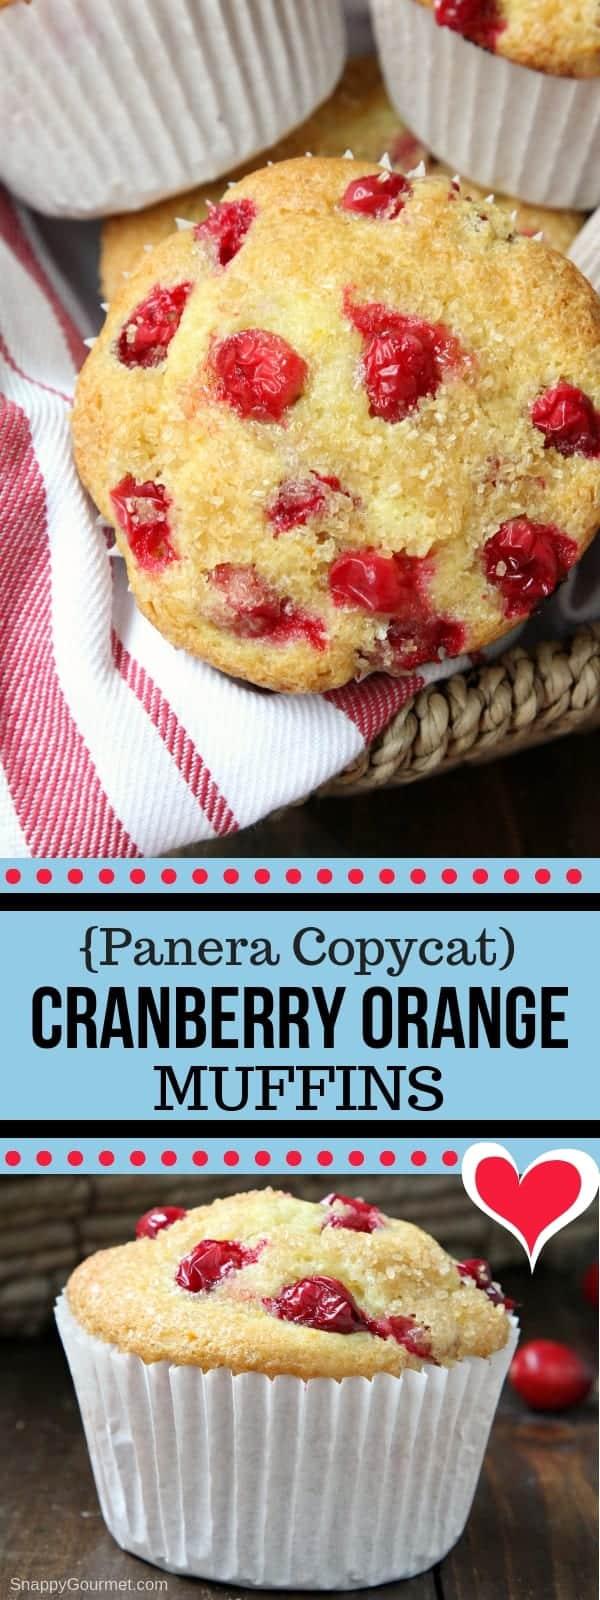 Orange Cranberry Muffins - Jumbo Copycat Panera Orange Cranberry Muffins recipe